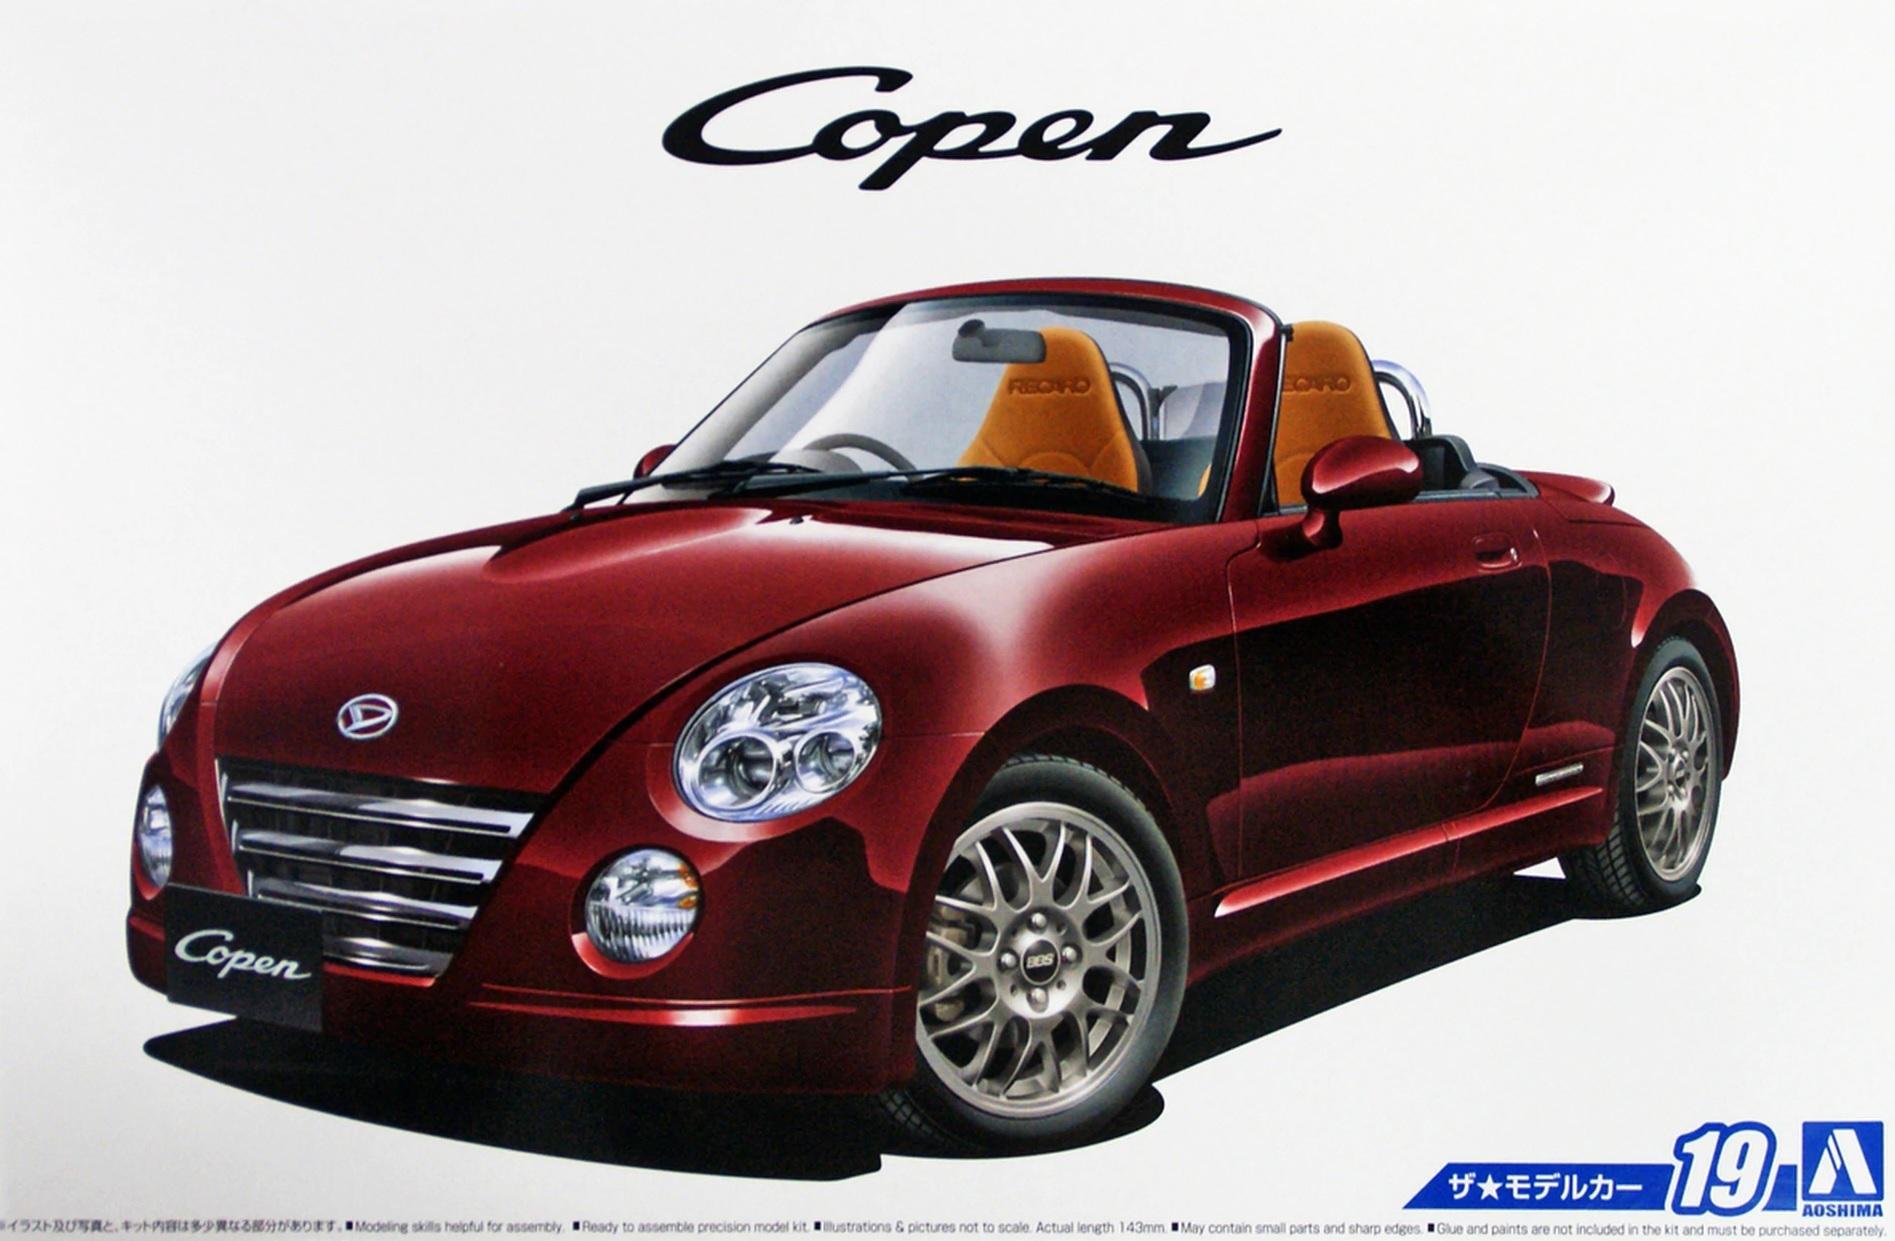 2006 Daihatsu Copen L880K Ultimate Edition 1:24 Model Kit Bausatz Aoshima 052273